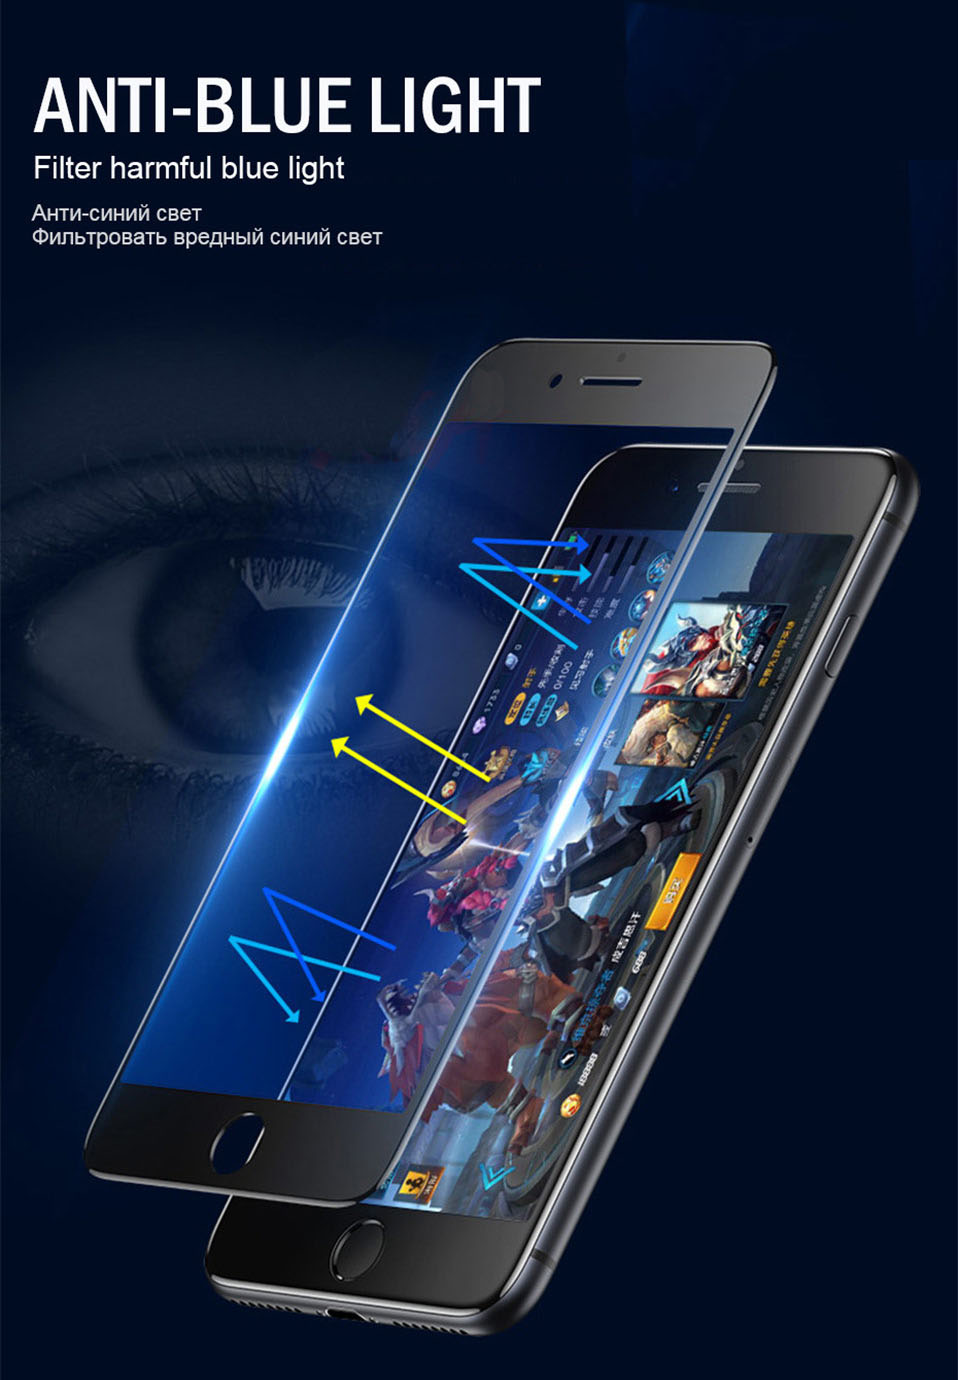 5D Glasses for iPhone 6 6s plus Glass Film Full Cover iphone6 Screen Protector for iPhone 6 6s 7 8 plus x Tempered Glass 3D 4D (8)